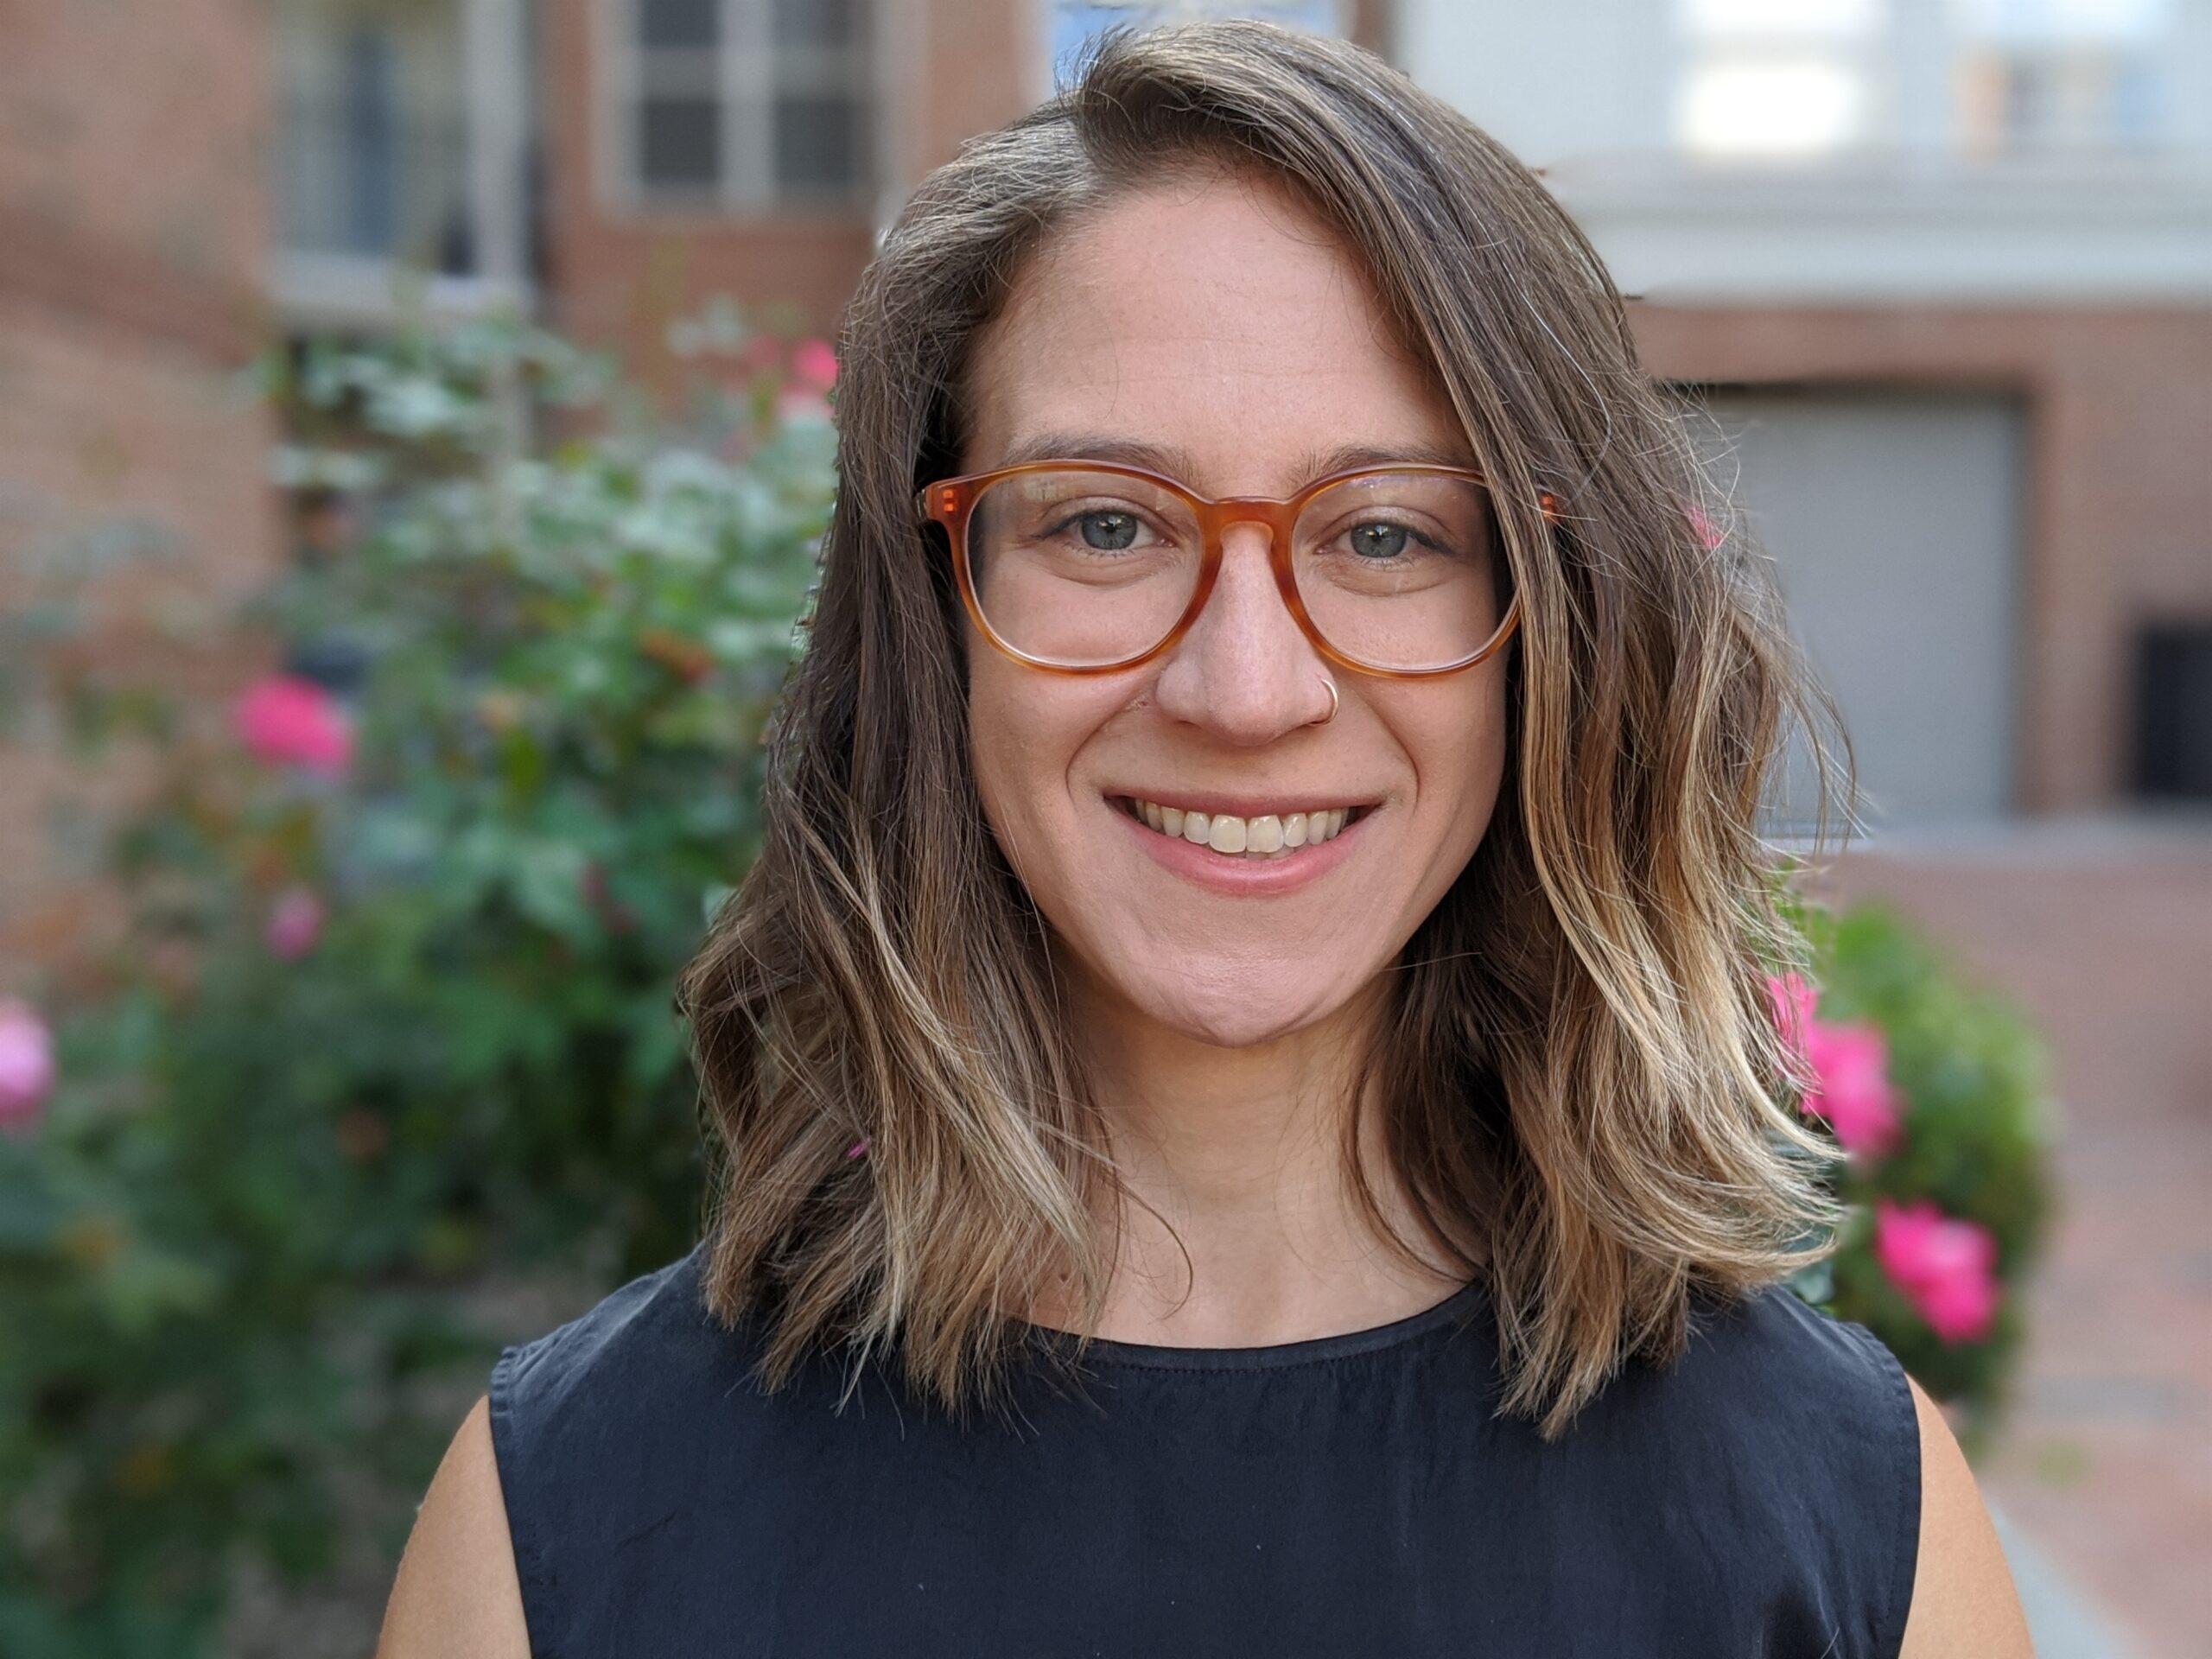 Nicole Torosin